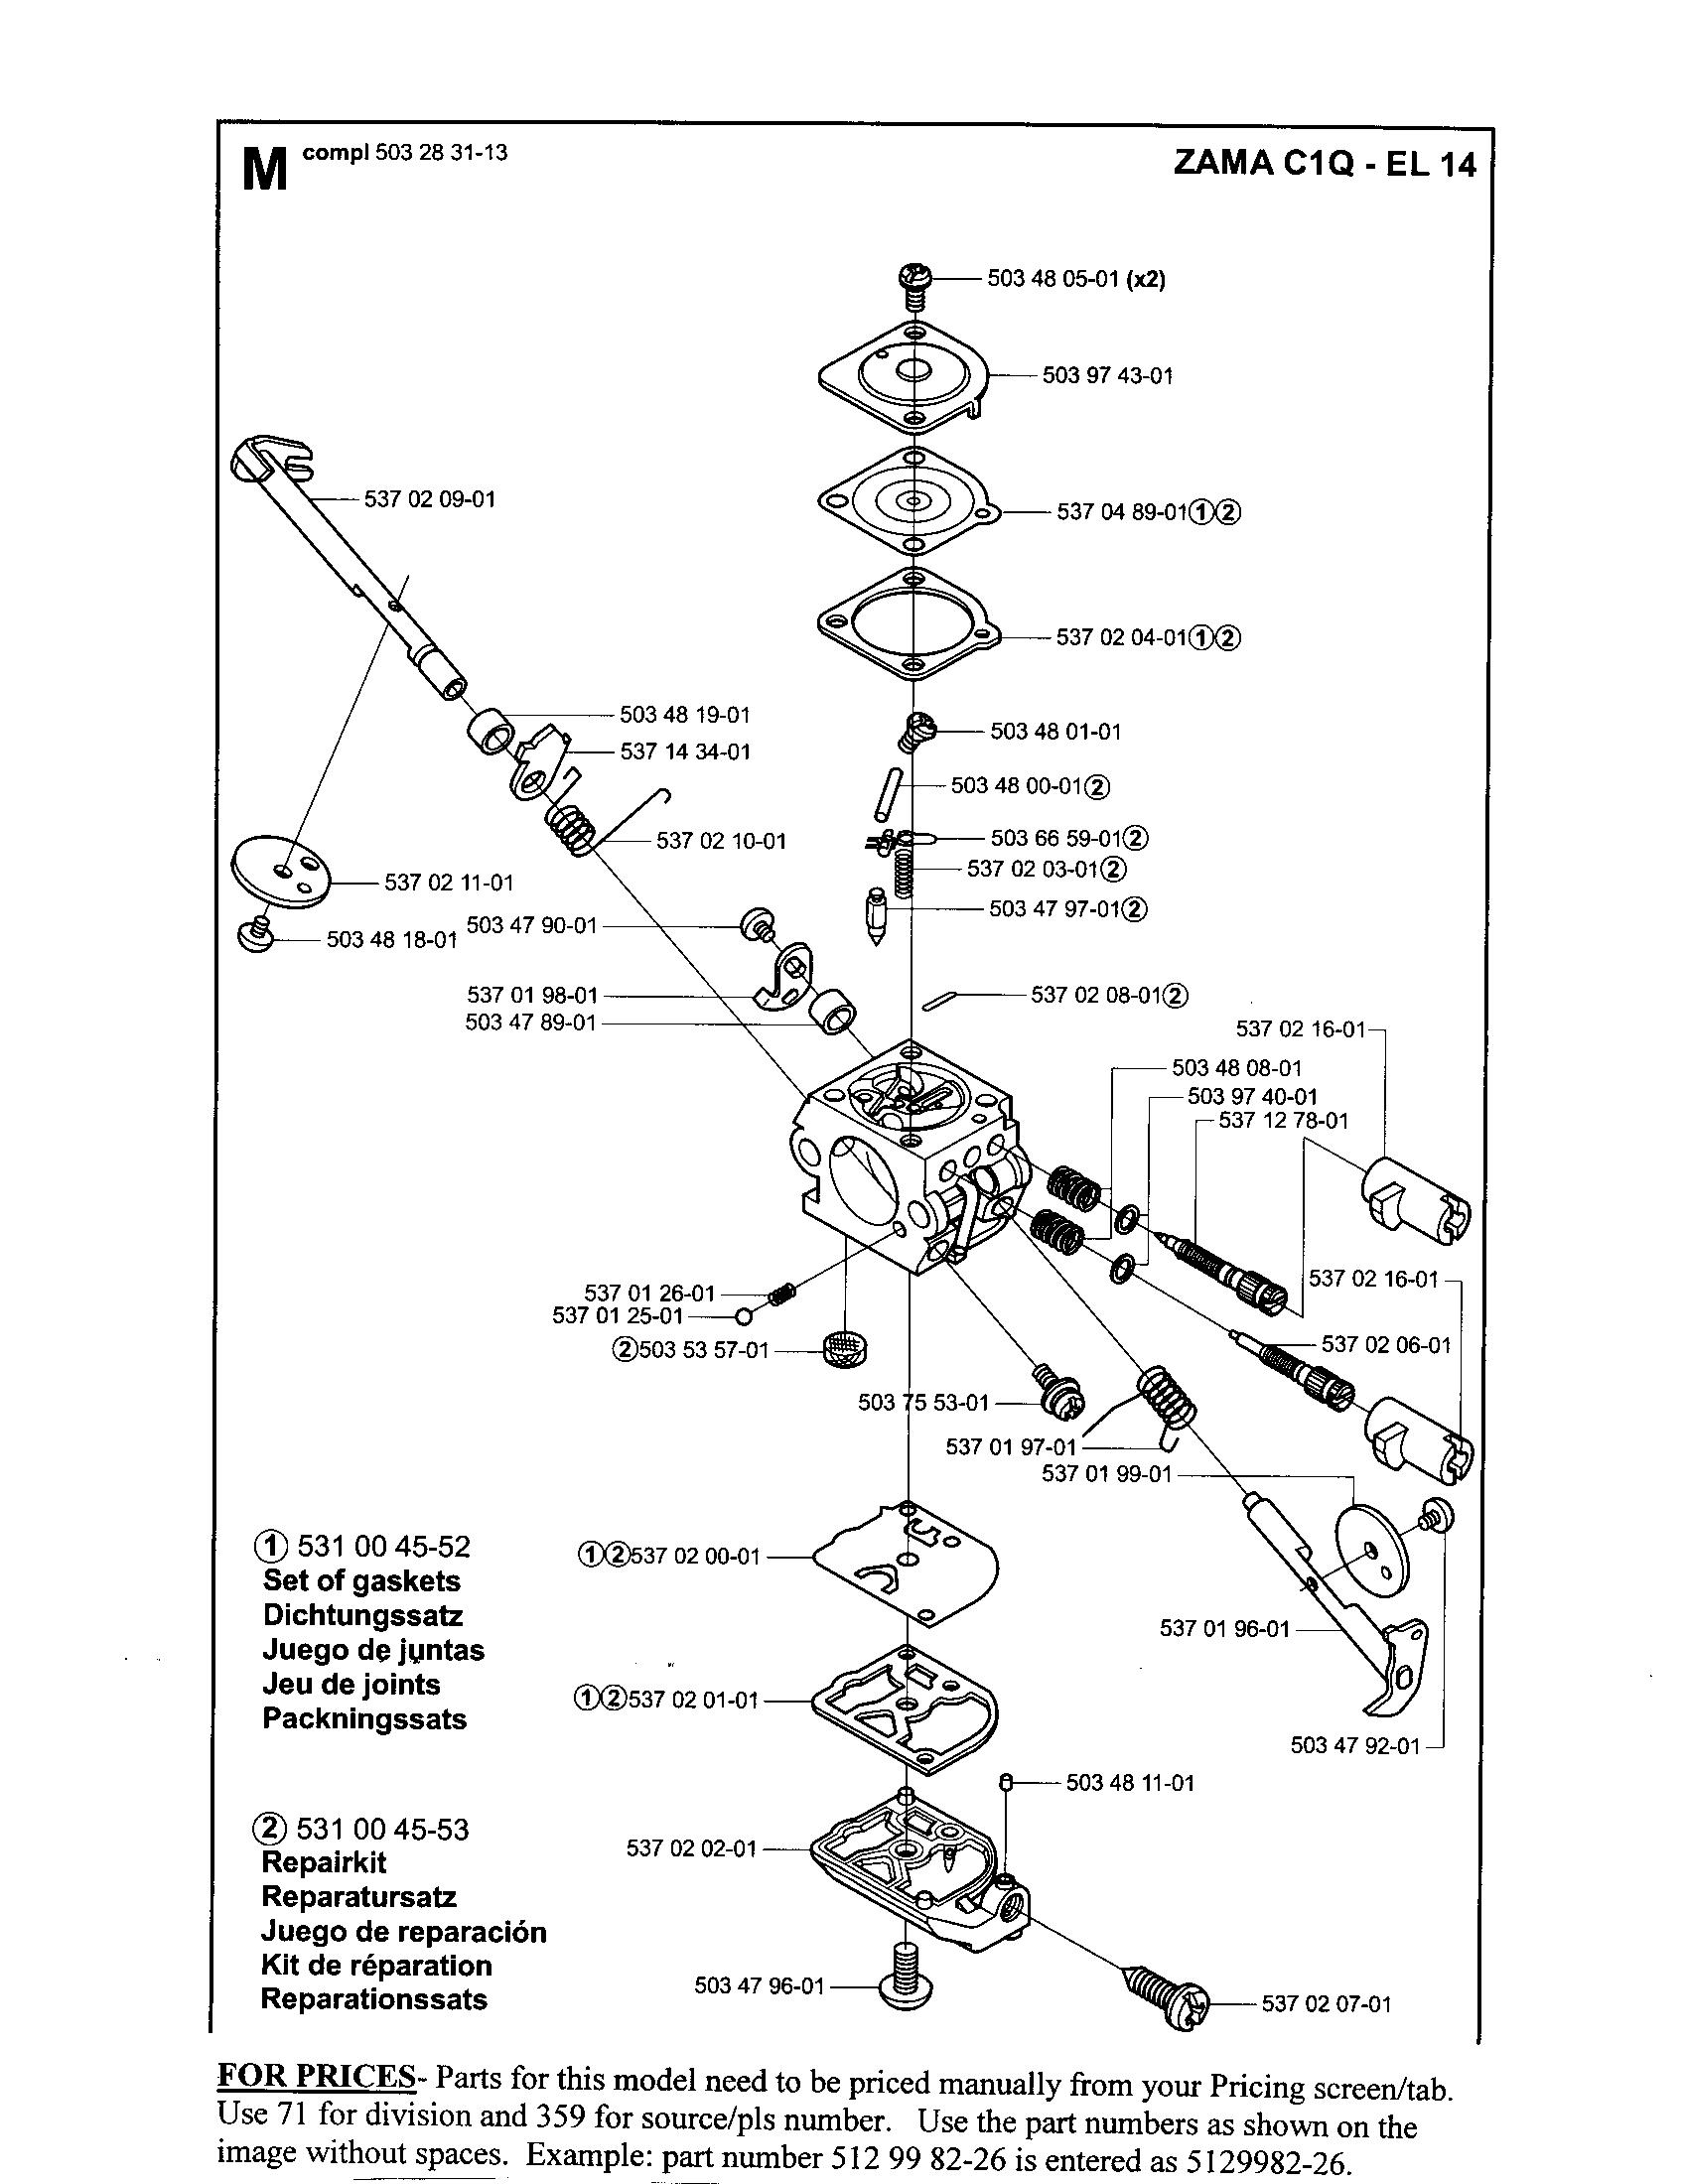 CARB Diagram & Parts List for Model 326HS75 Husqvarna